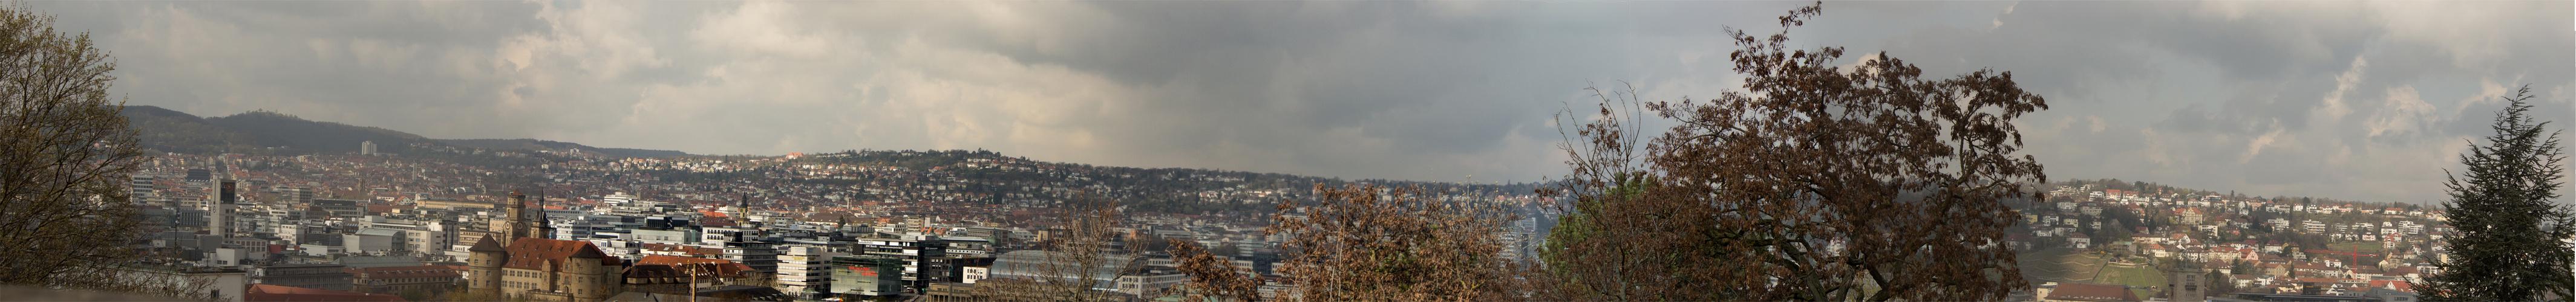 Wetterlage in Stuttgart